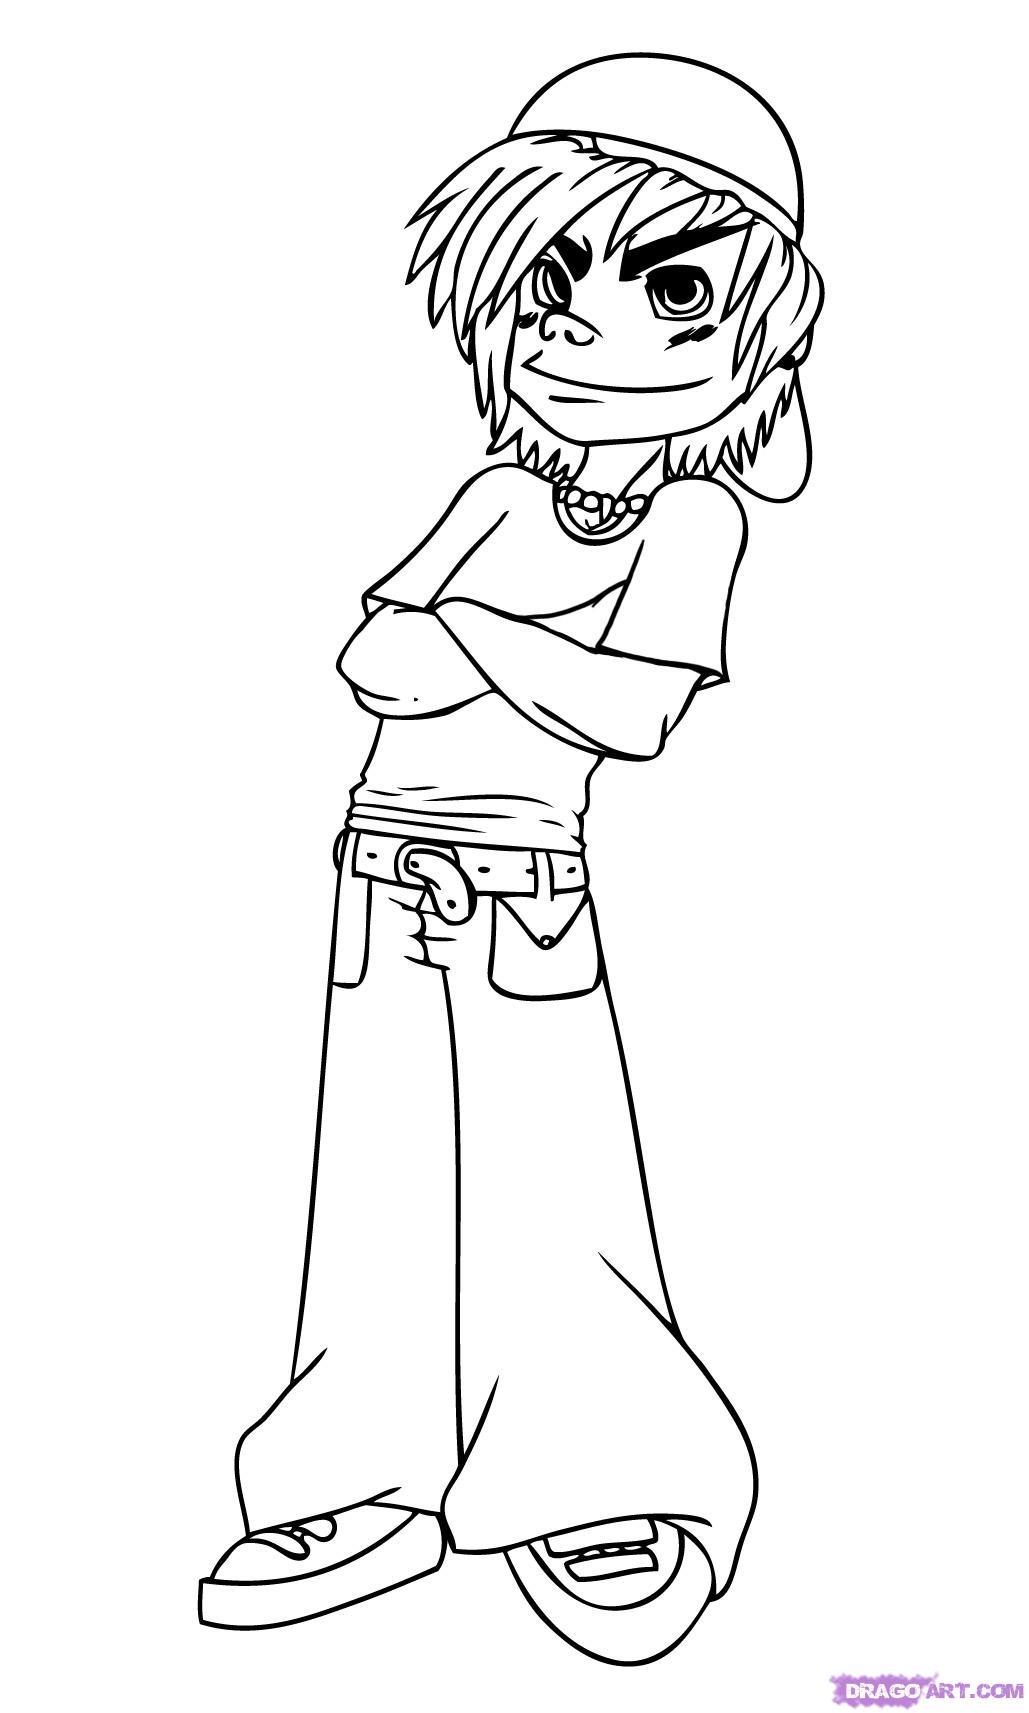 1029x1713 Cartoon Drawing Of A Boy How To Draw A Cartoon Kid, Step By Step